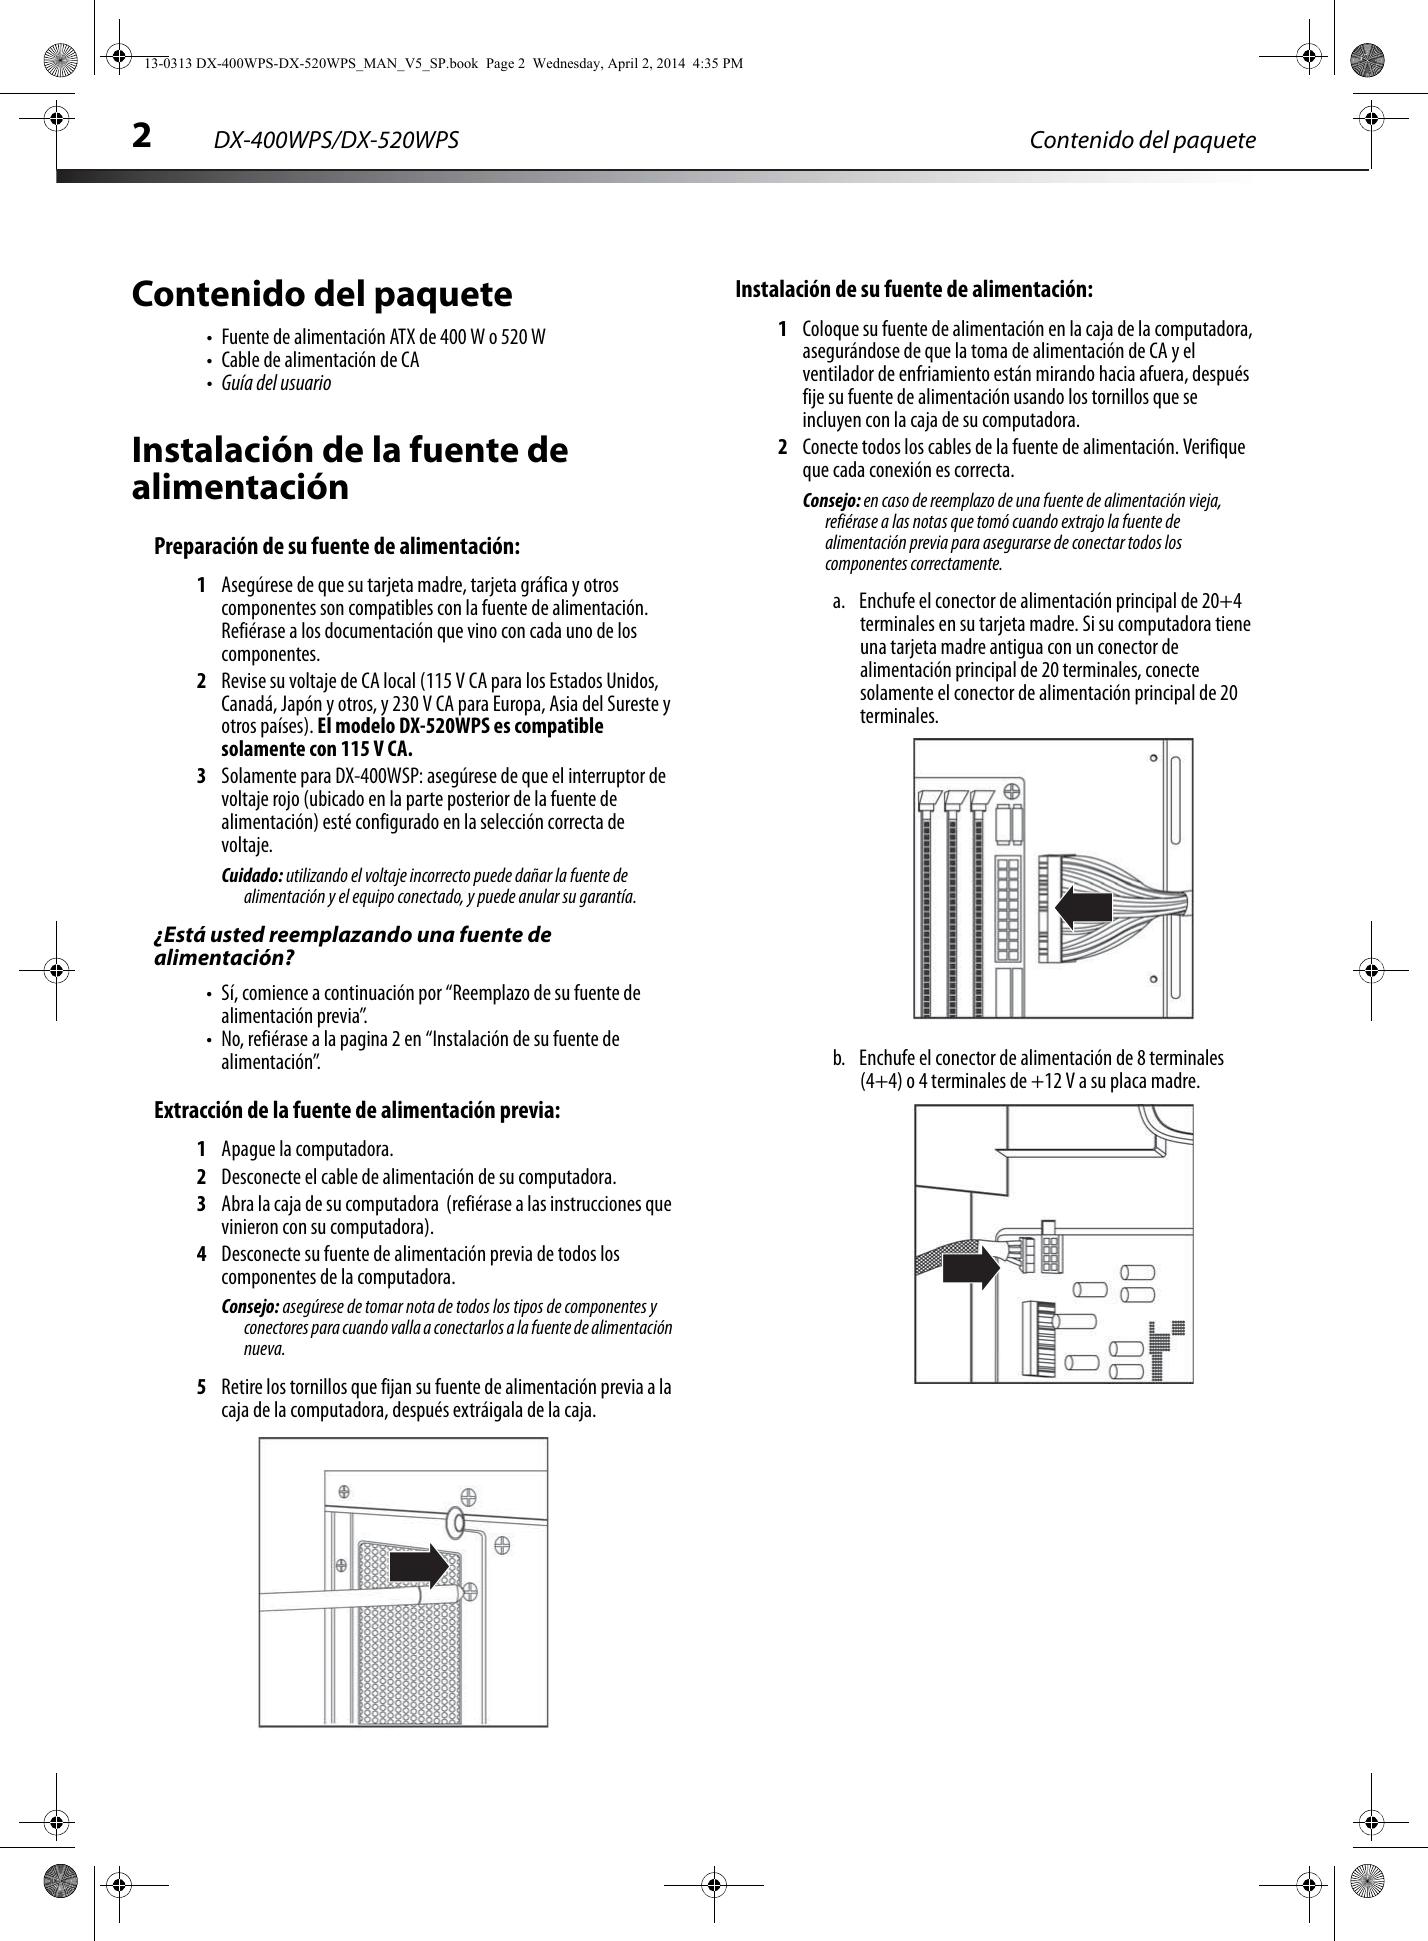 dynex 400 watt atx cpu power supply white users manual 13 0313 dx rh usermanual wiki Quick Reference Guide User Manual